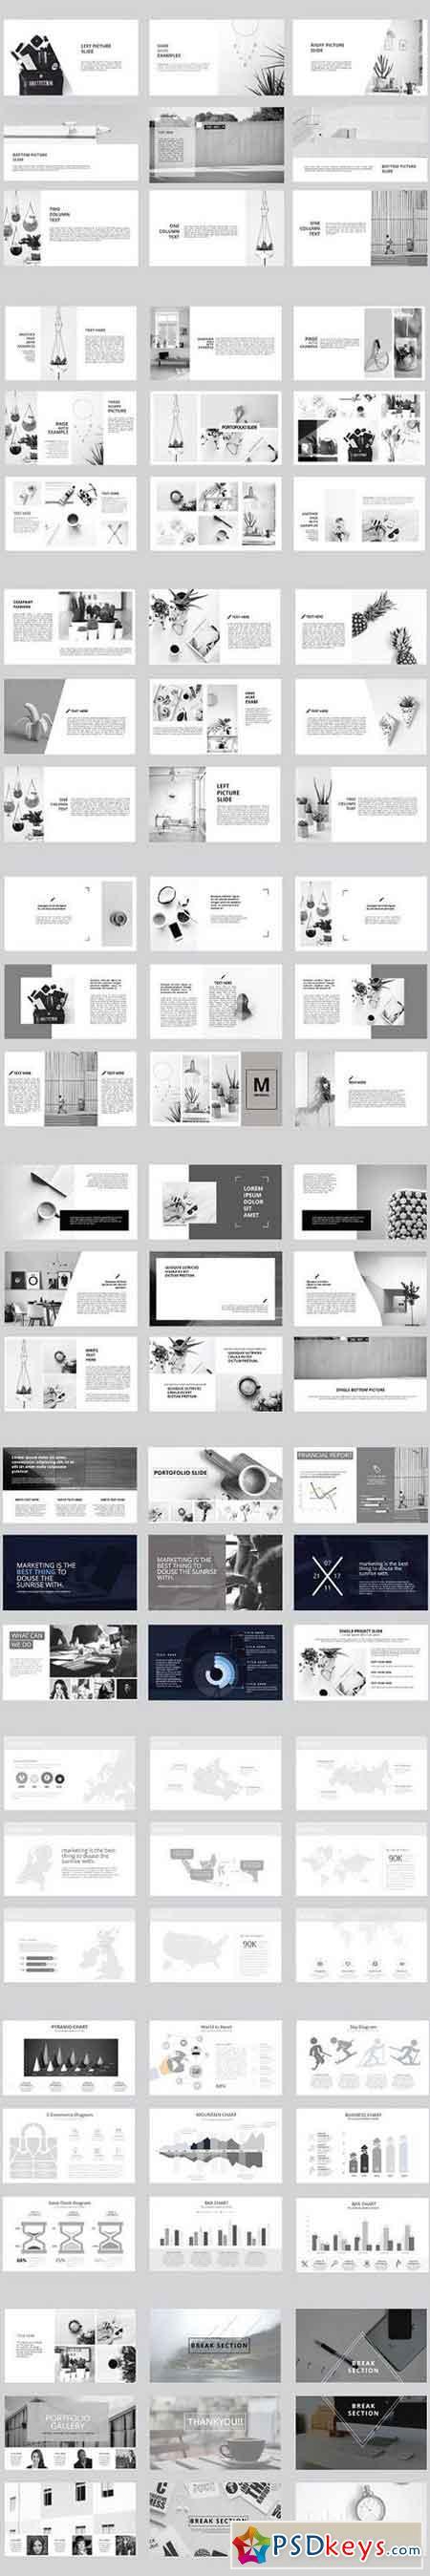 Minimal Presentation Template 1330045